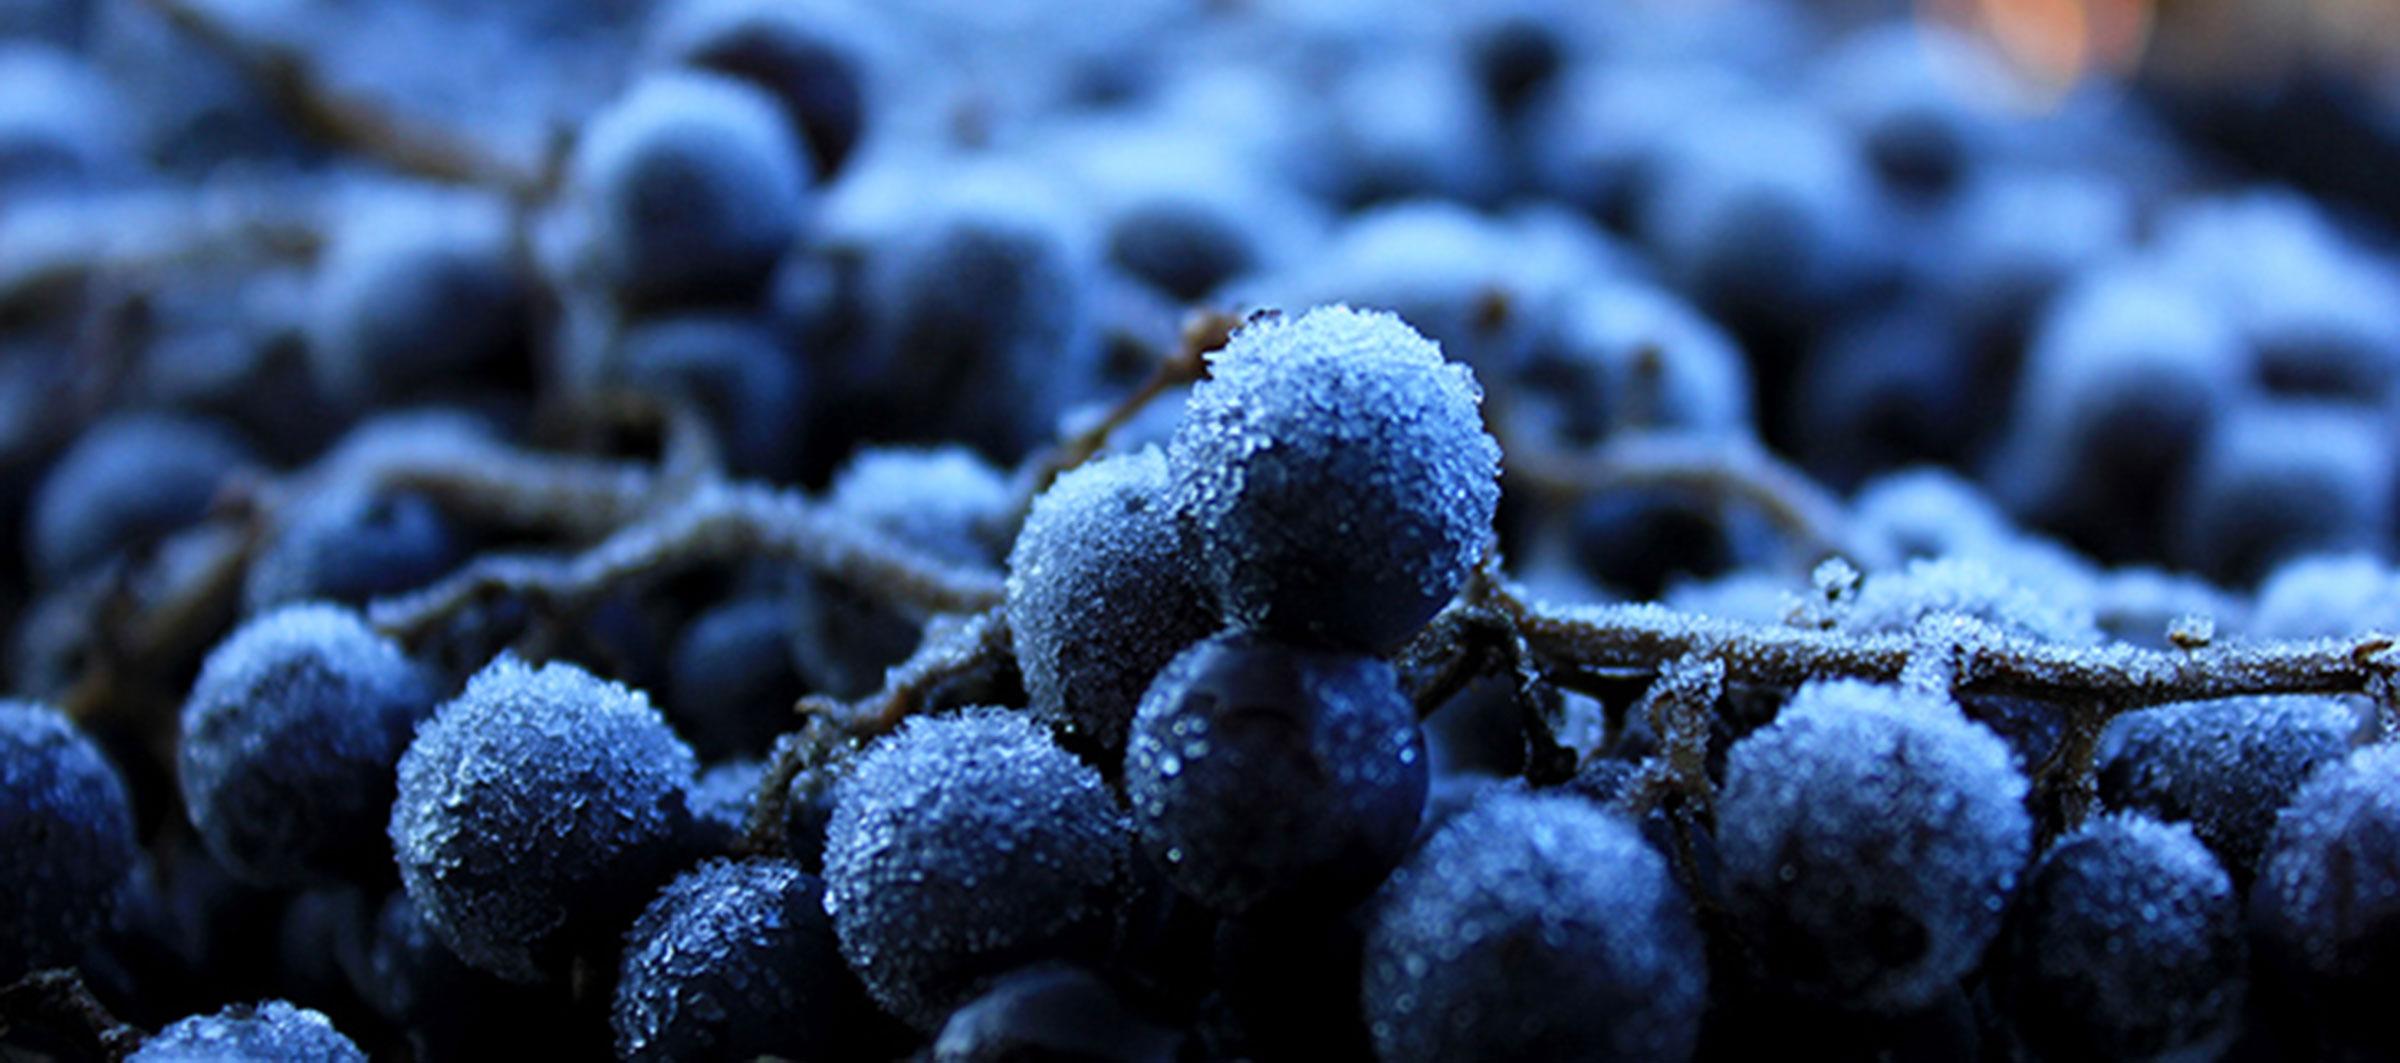 Unseasonable greetings for washington states vineyards wsu wine kristyandbryce Gallery